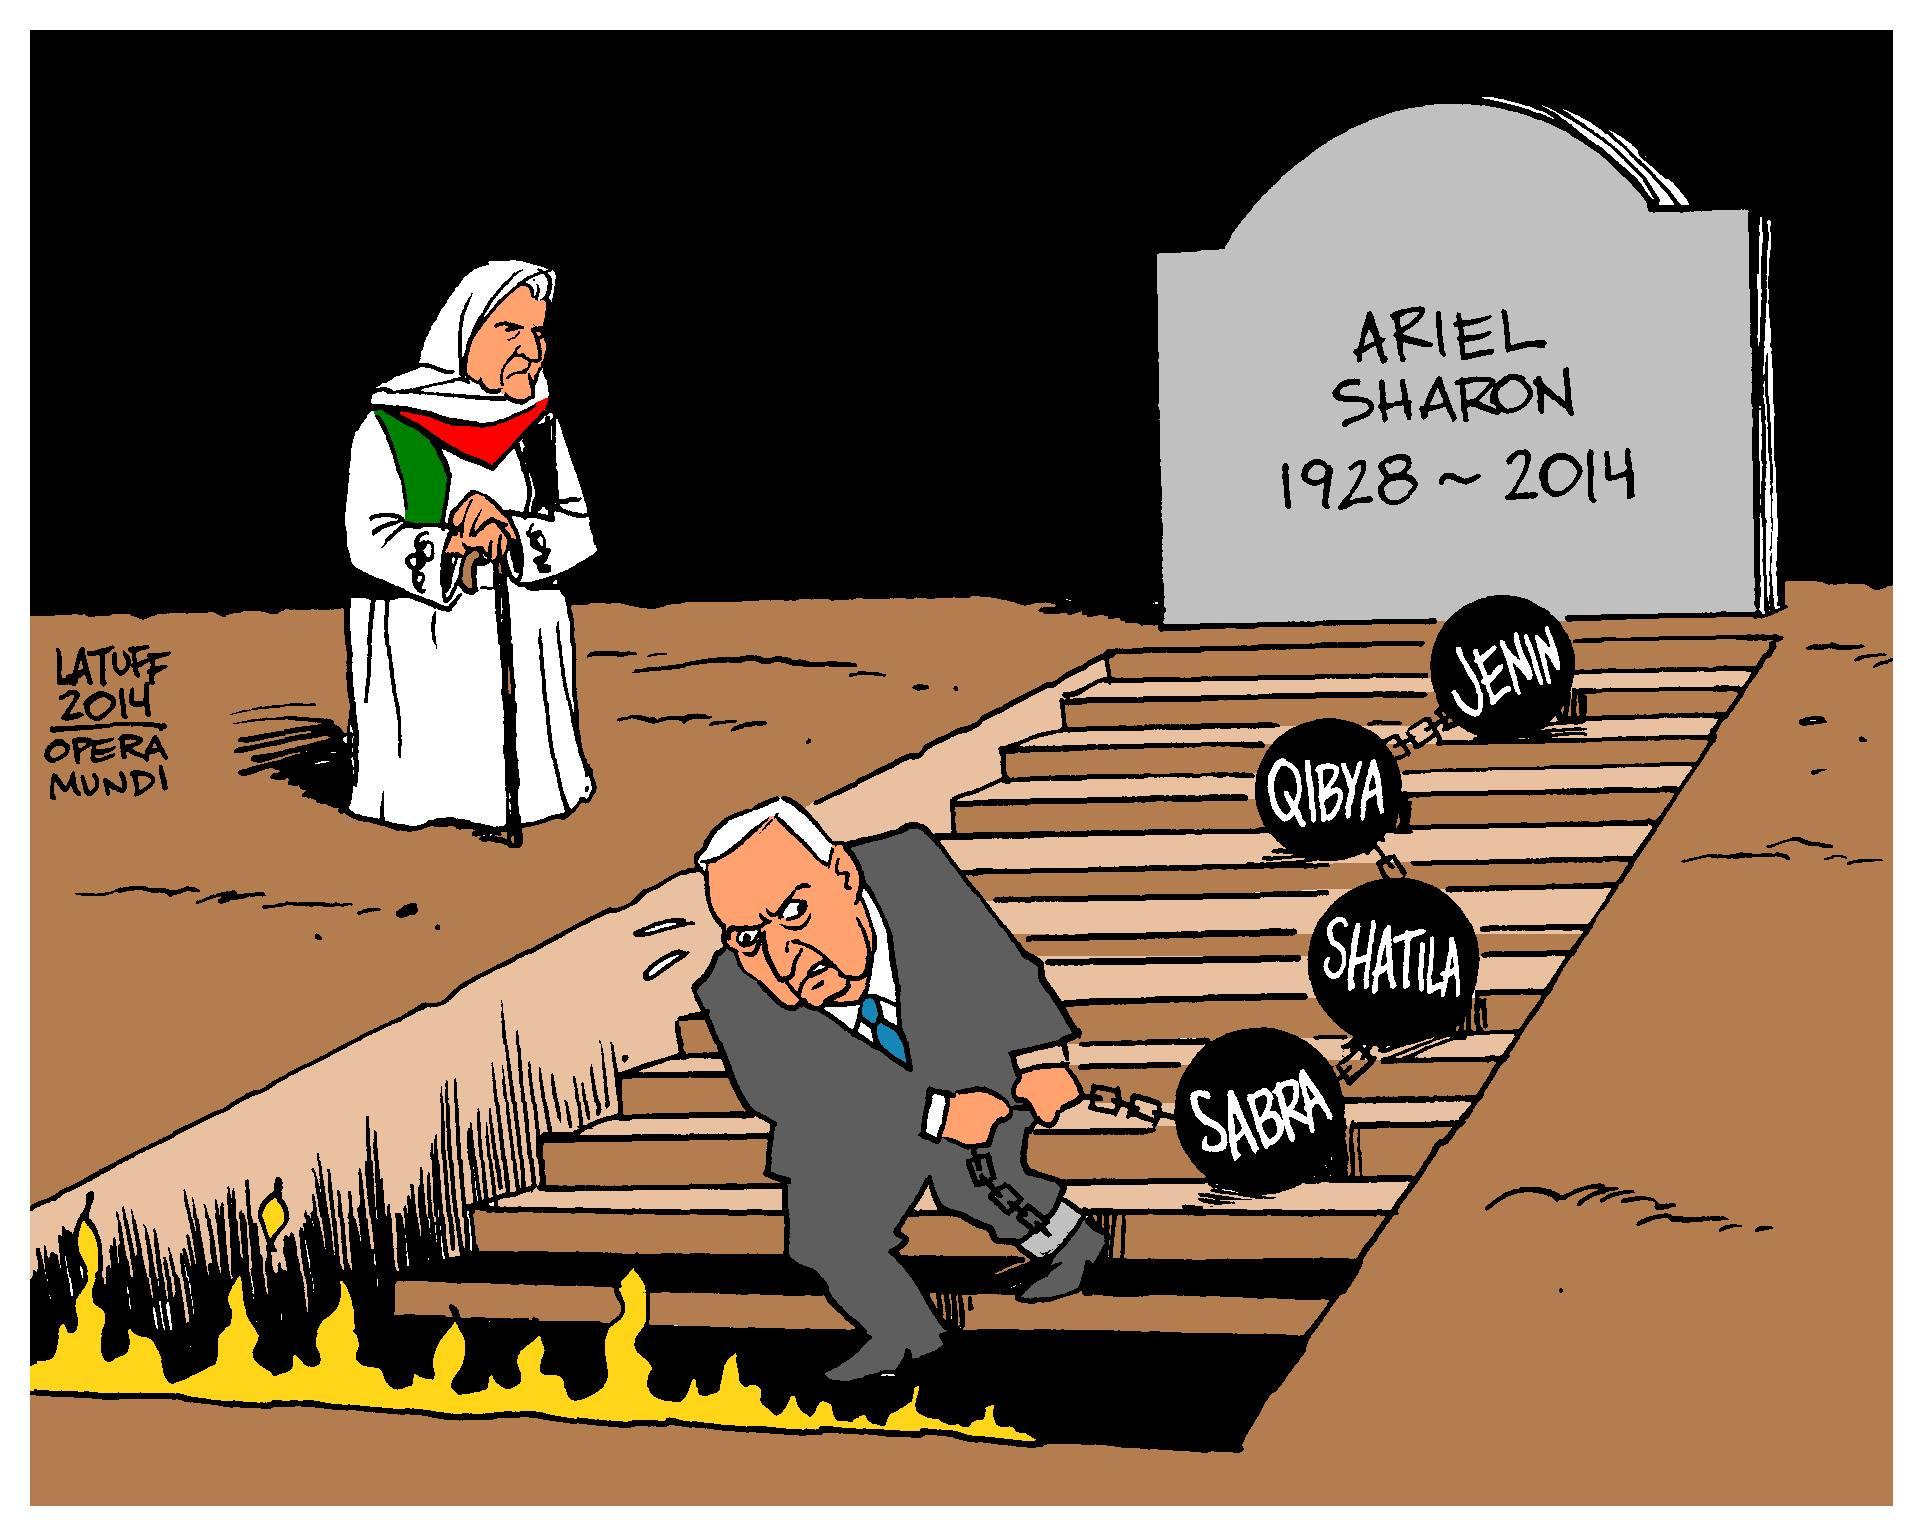 Ariel_Sharon_Latuff_2014_2.jpg